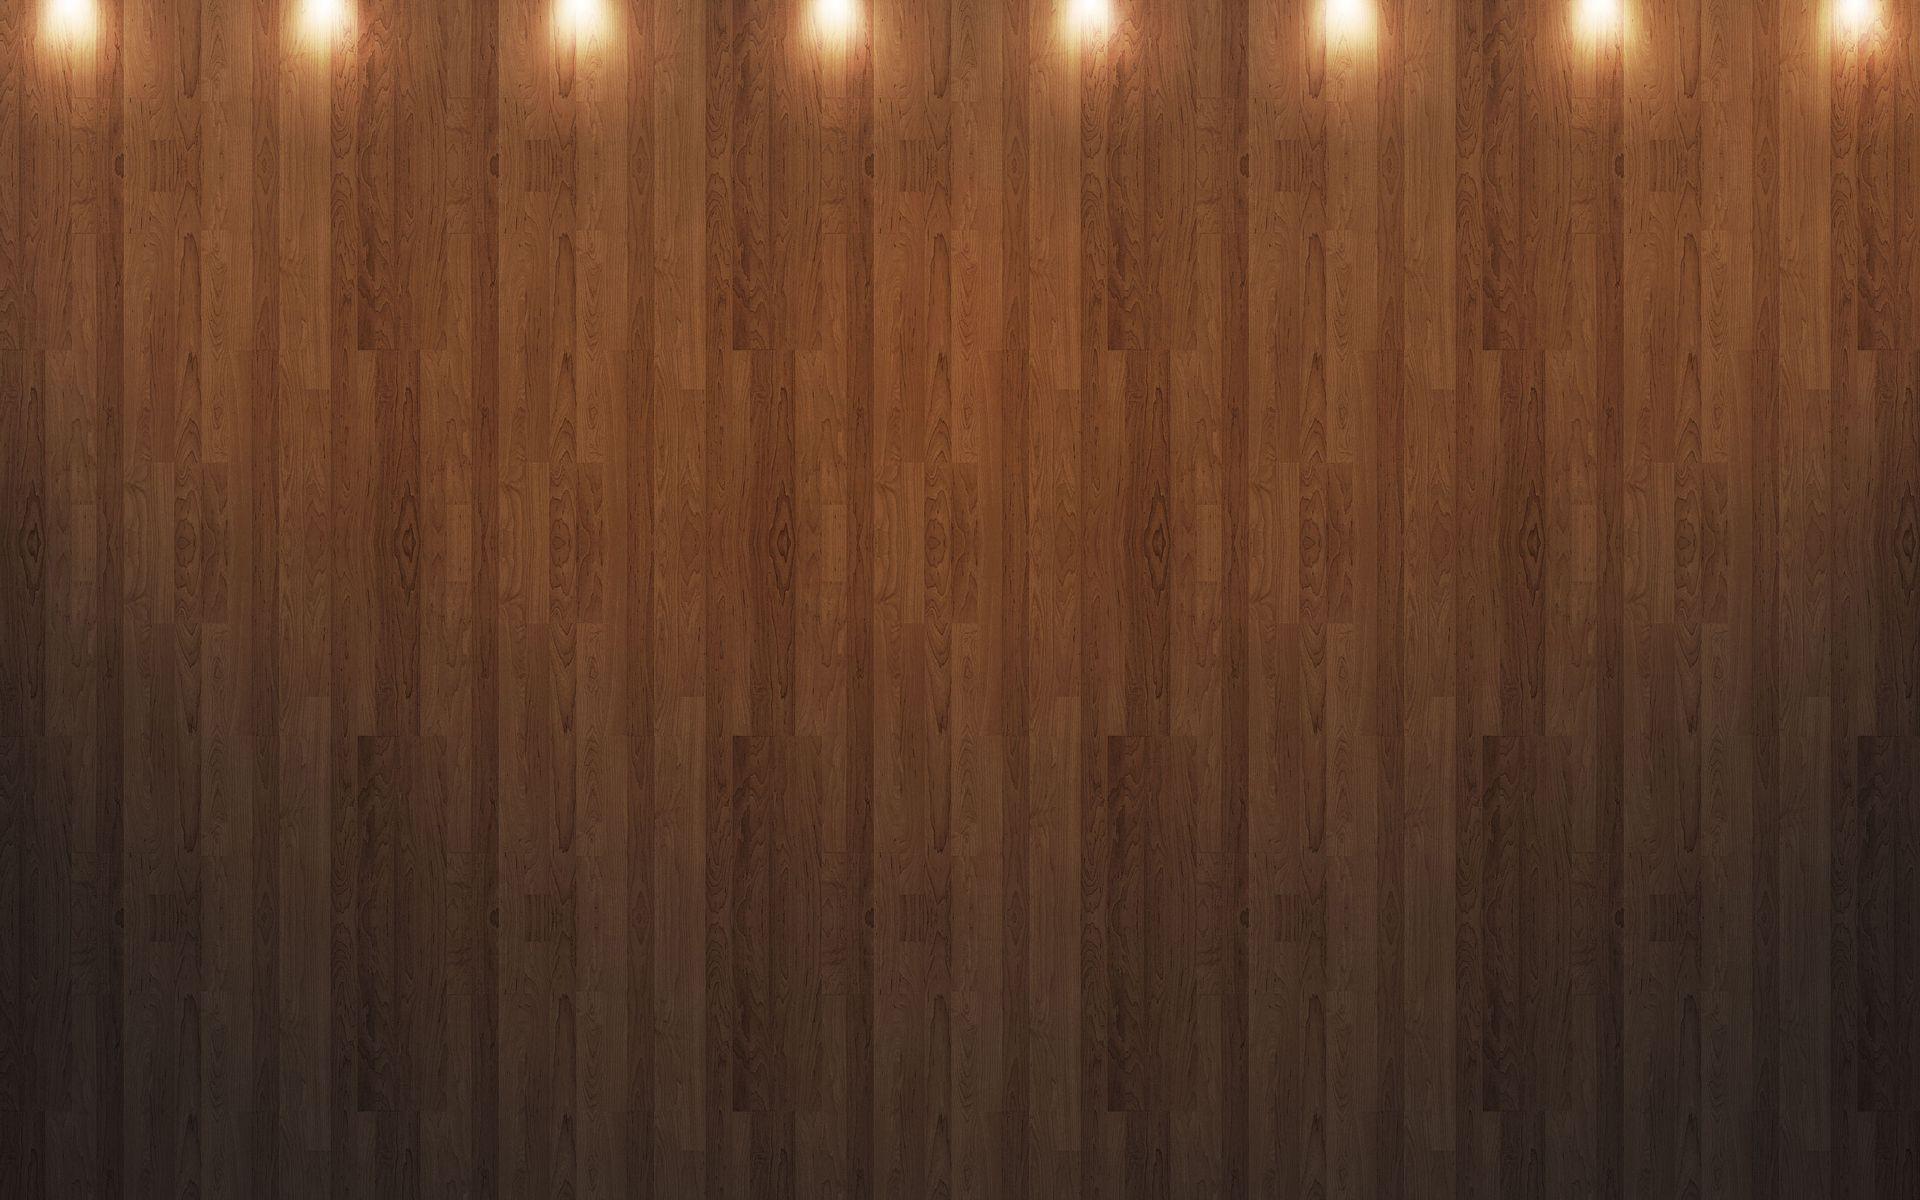 Wallpapers Backgrounds Popular Wallpaper Filter Wood Lights Resolutions Room Hardwood Zyklophon Wood Pattern Wallpaper Picture On Wood Wood Wallpaper